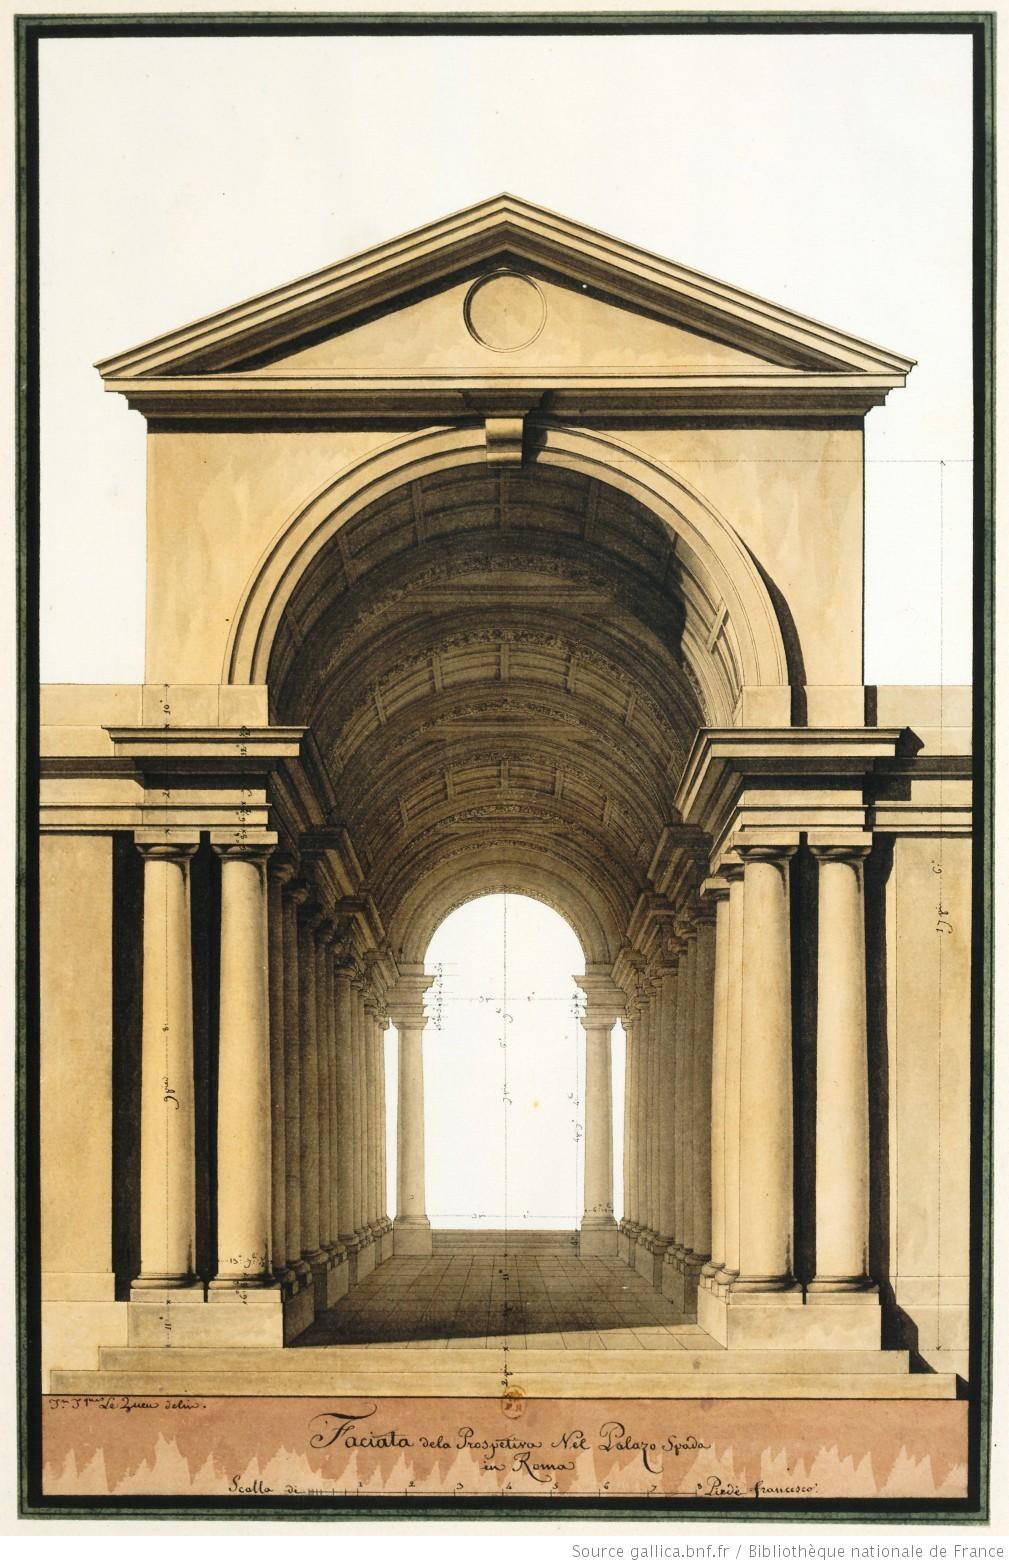 Faciata dela prospetiva nel Palazo [sic] Spada in Roma : [dessin] / Jn Jques Le Queu delin. - 1